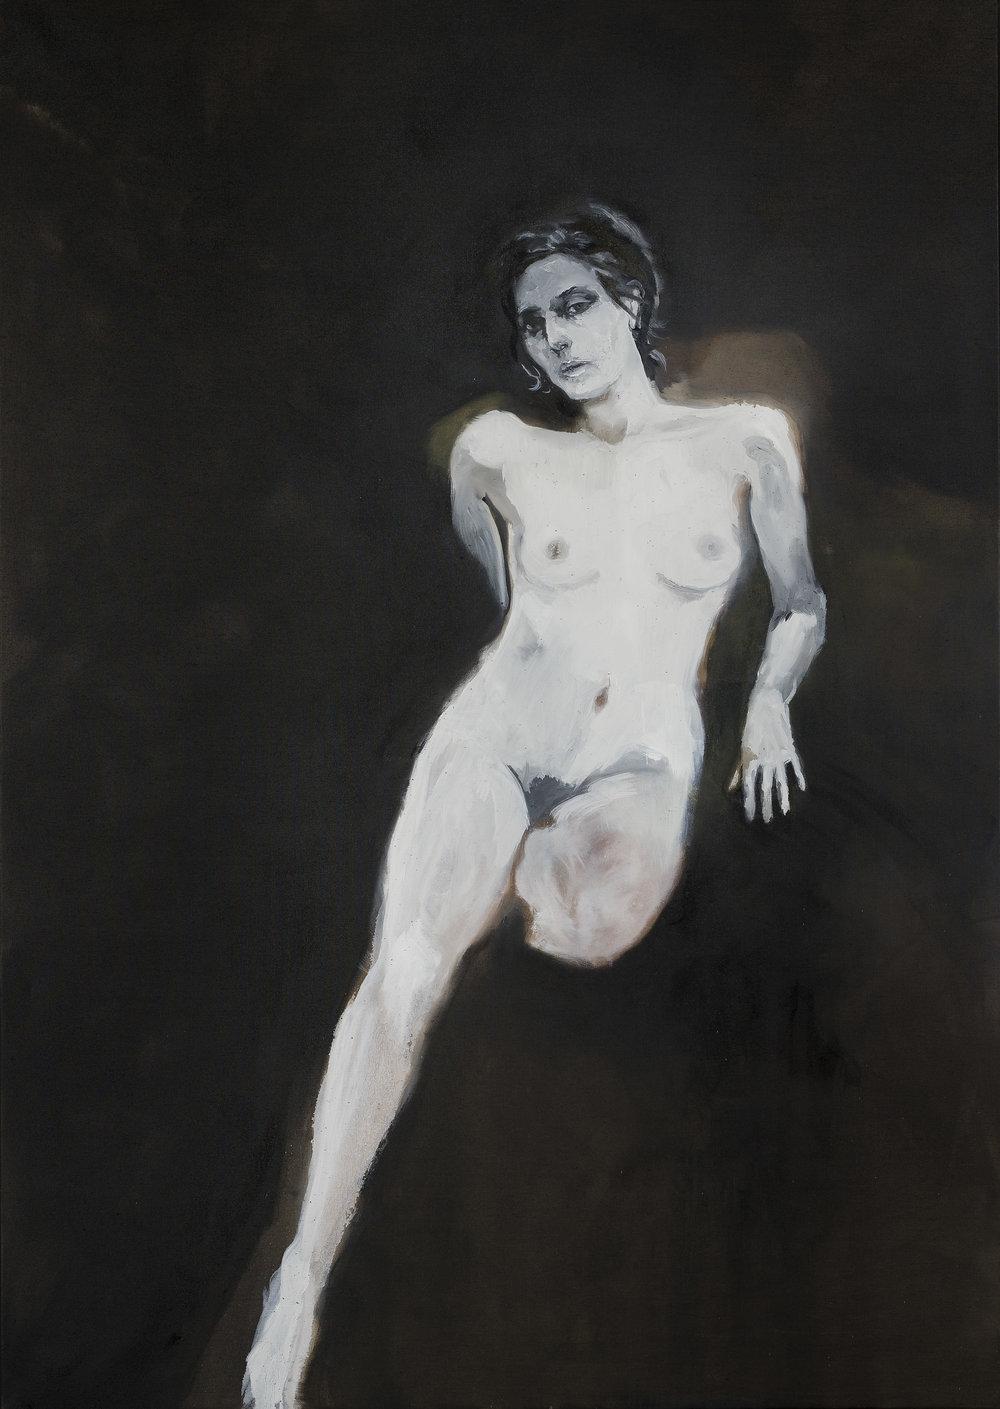 Telphouse - 2015194 x 137 cm